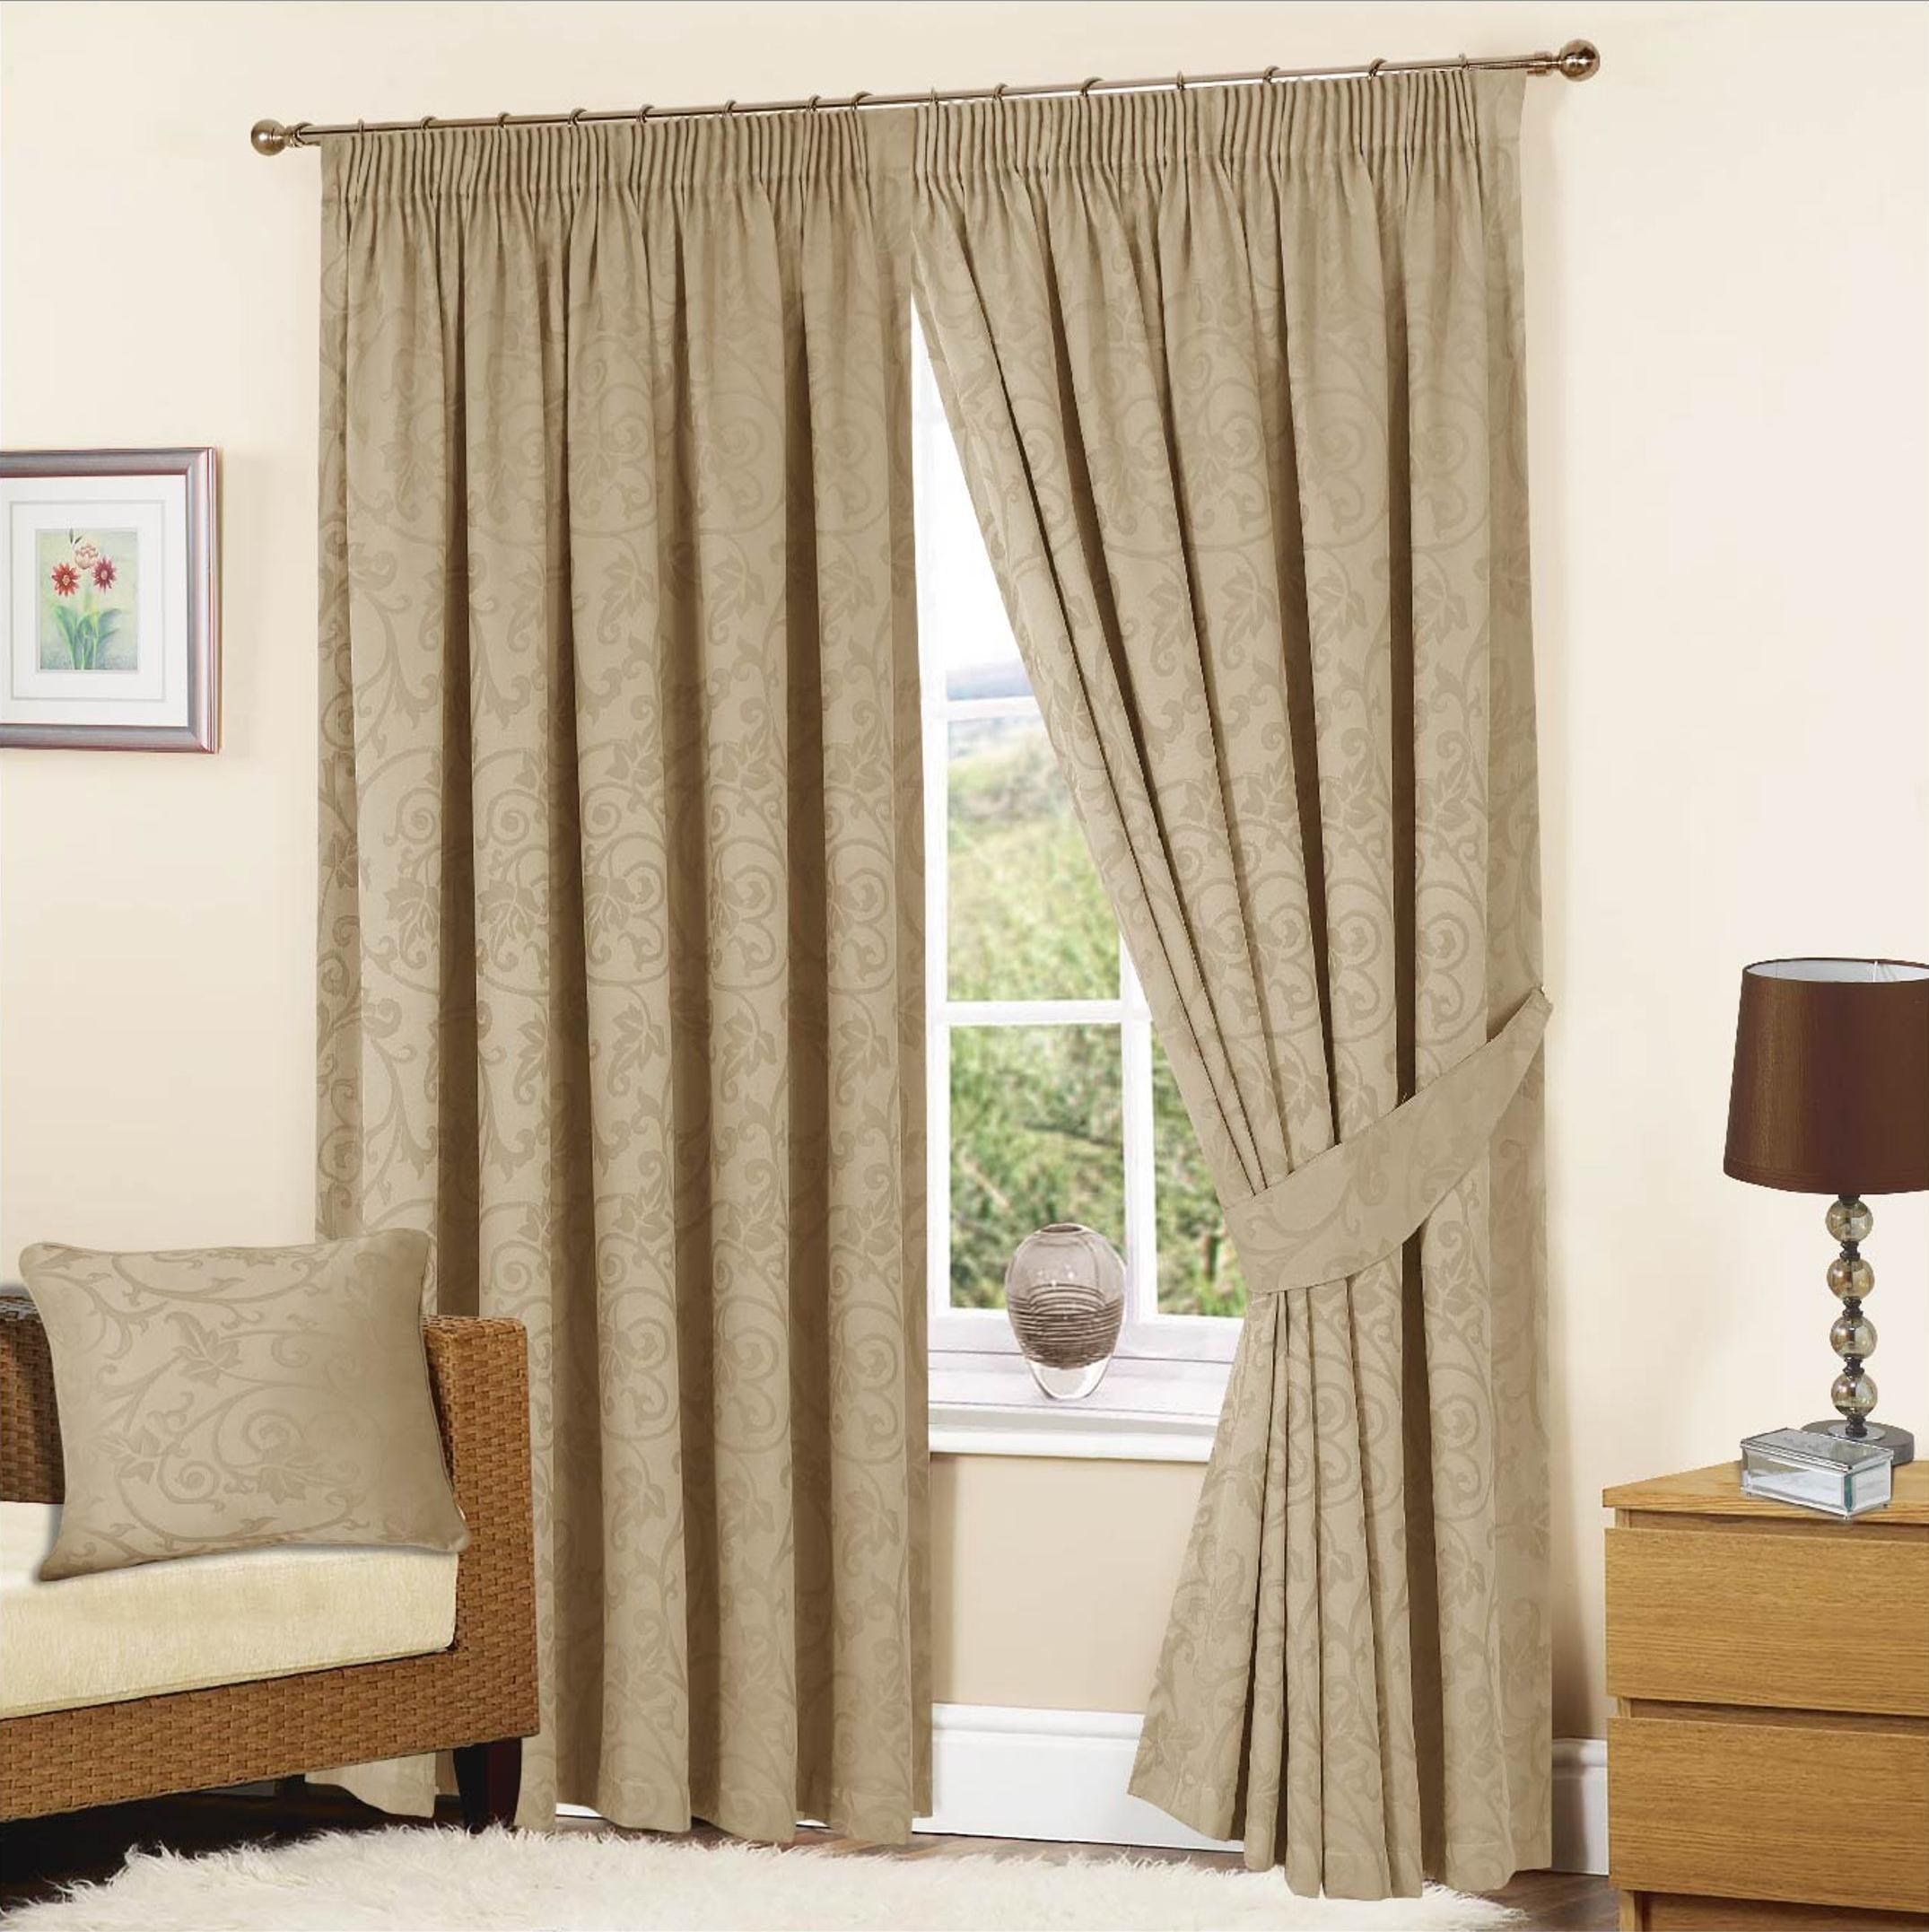 wallpaper curtains beach drapes products bridge aj wood